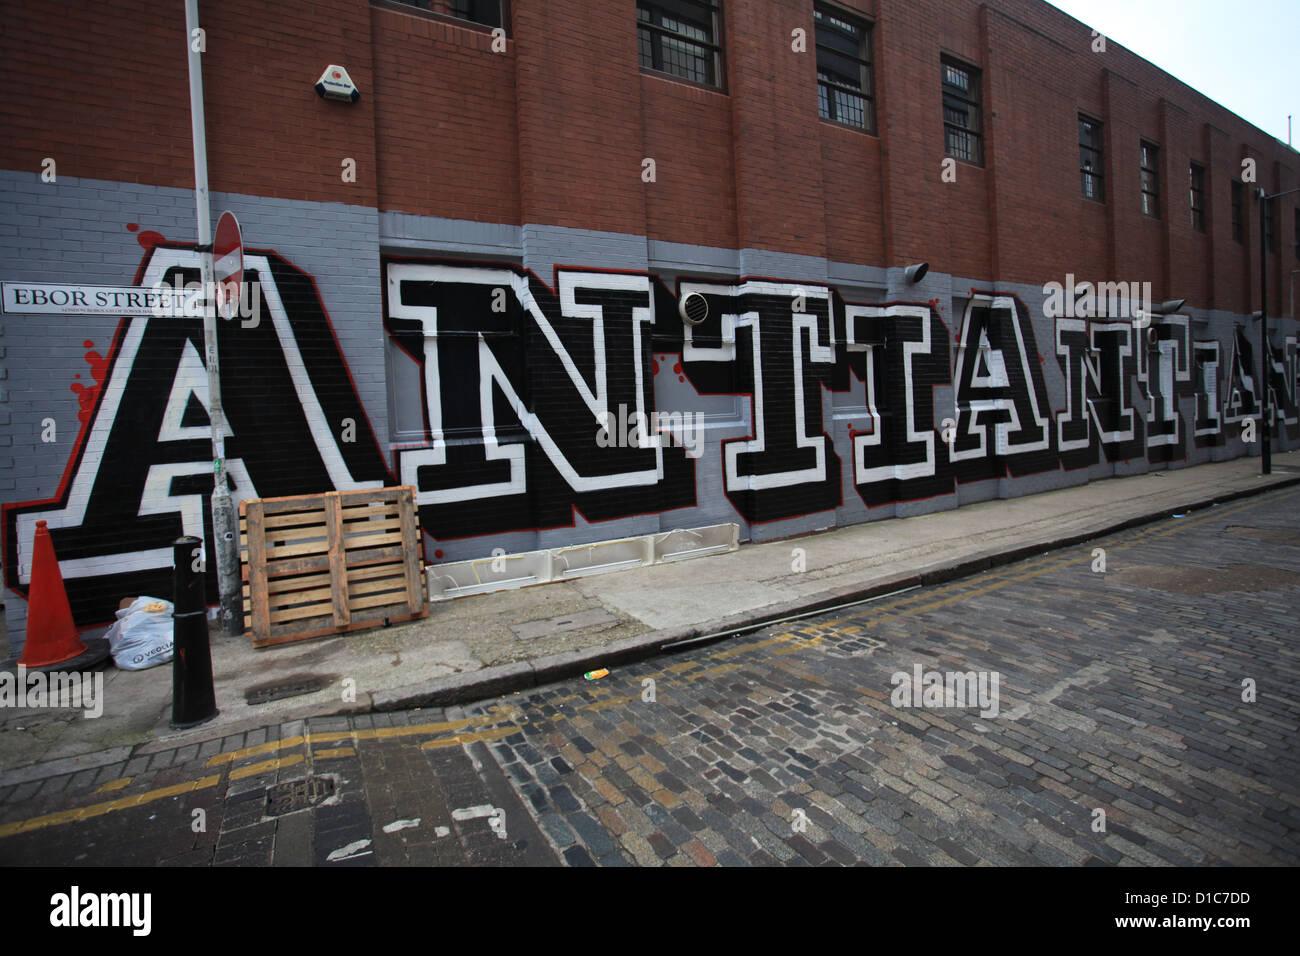 Graffiti artwork by Eine - Stock Image